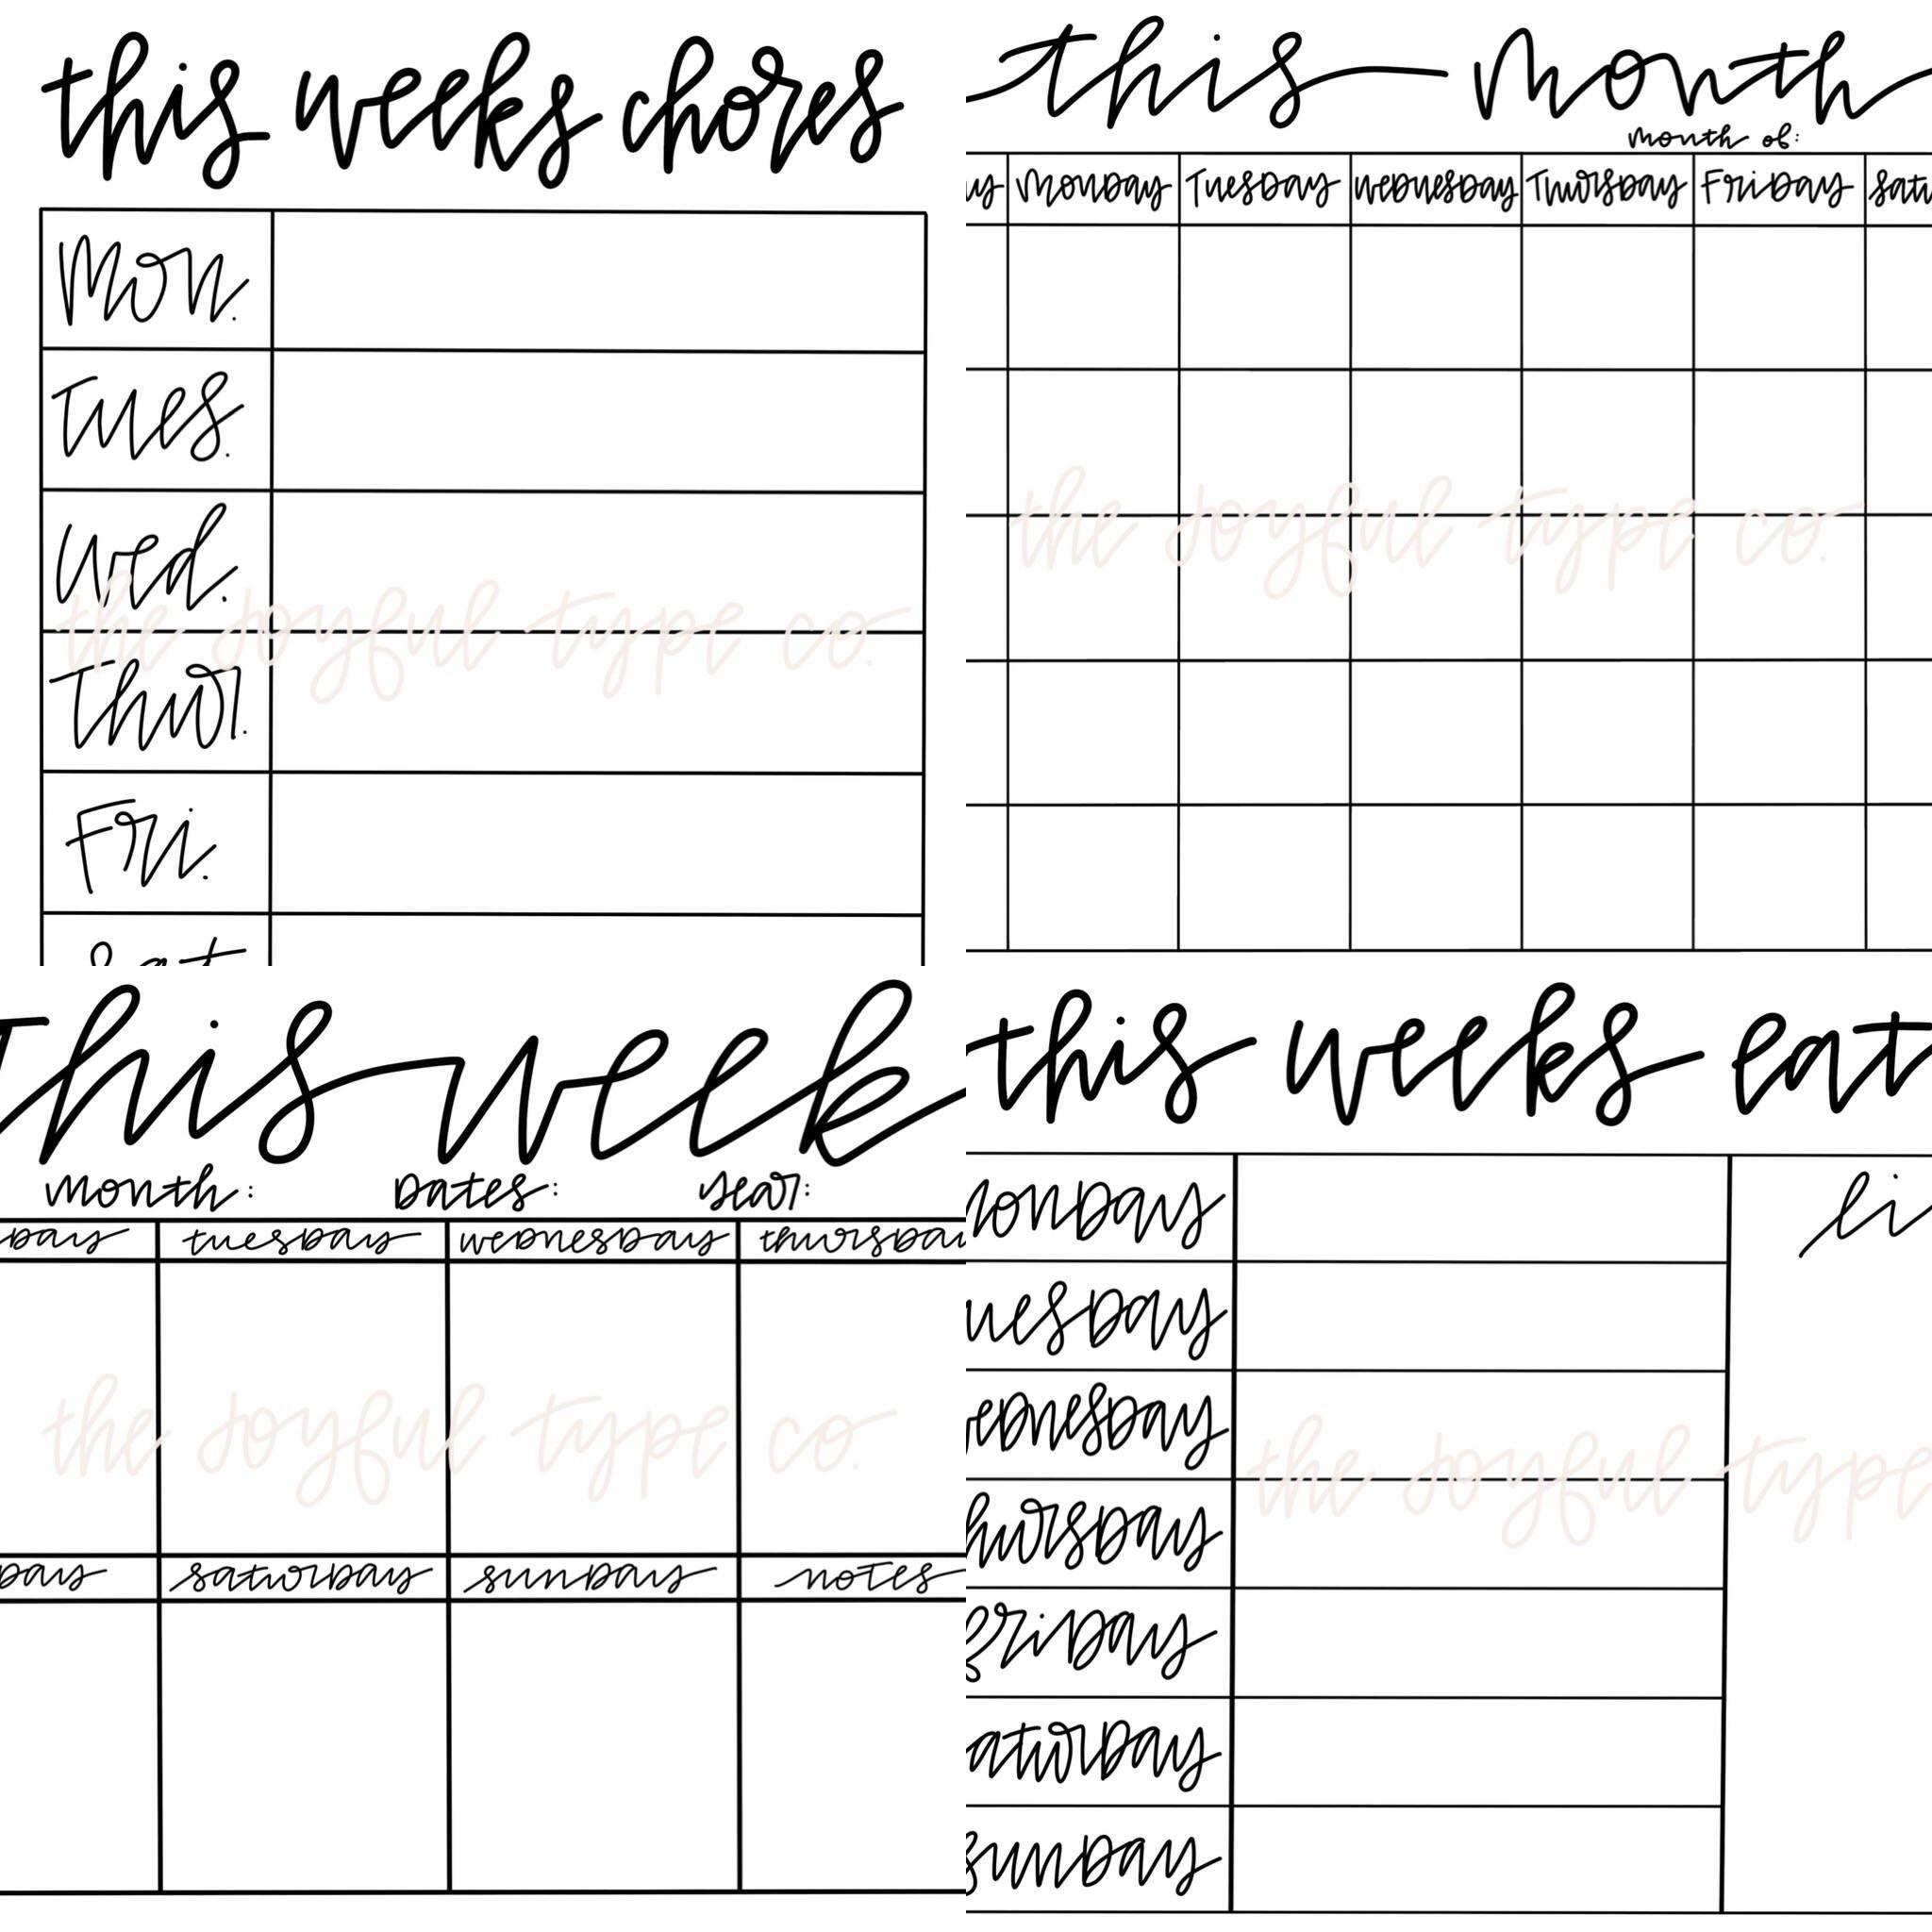 Printable Calendar / Printable Menu / Printable Chore Monday Thru Sunday Menu Template